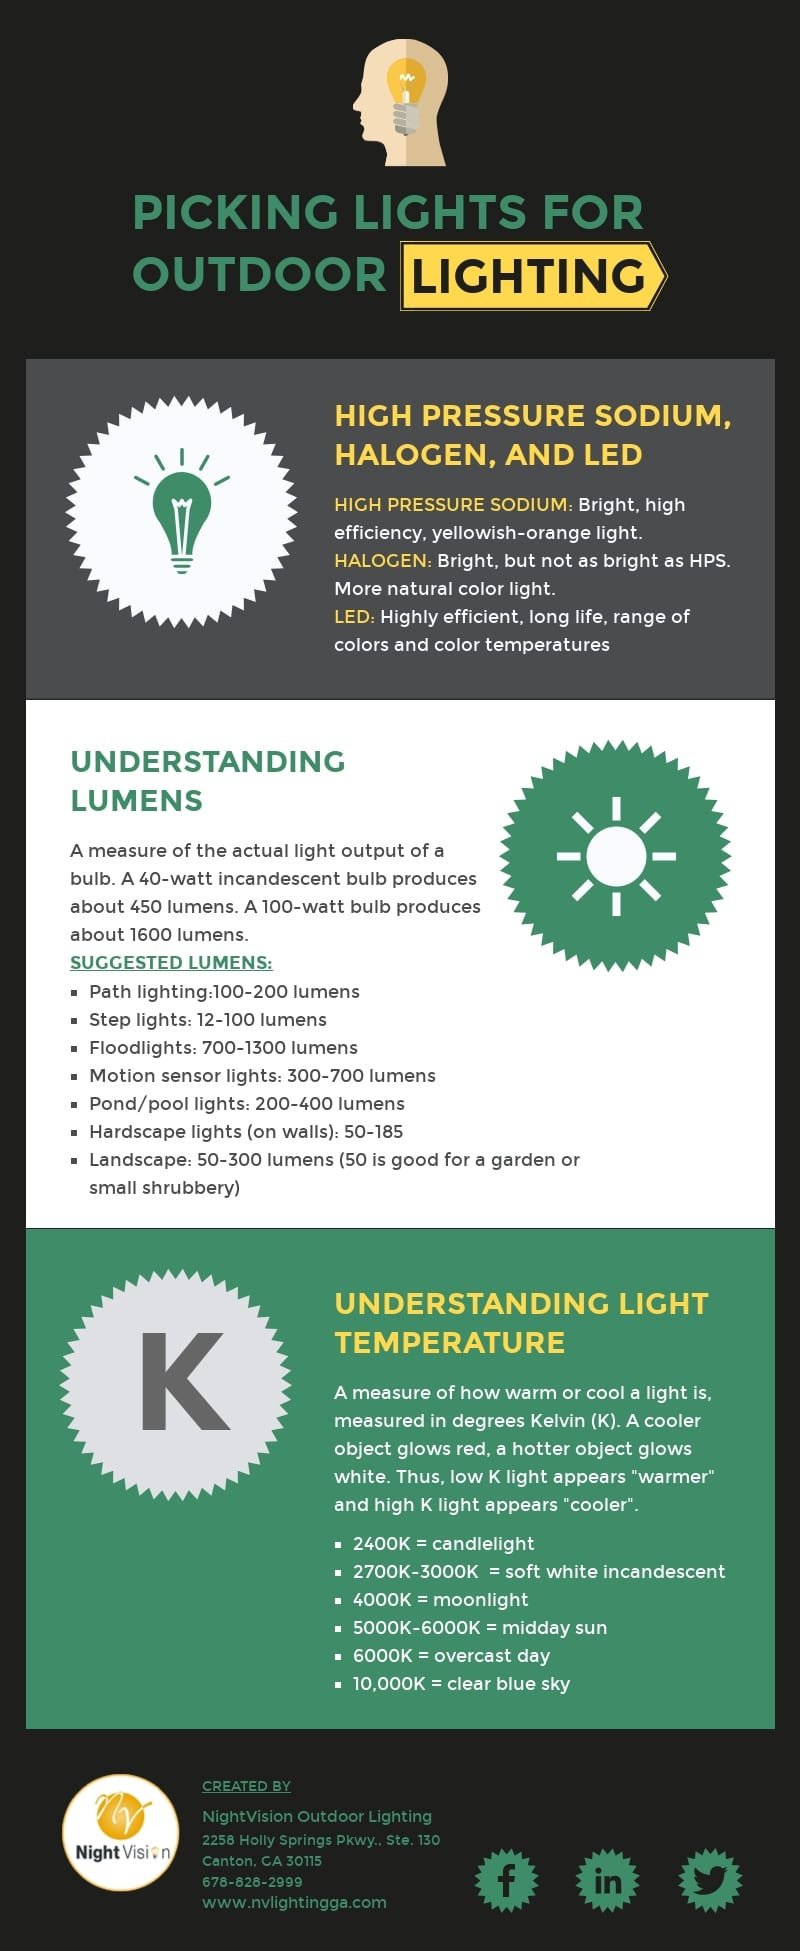 Picking Lights for Outdoor Landscape Lighting [infographic]